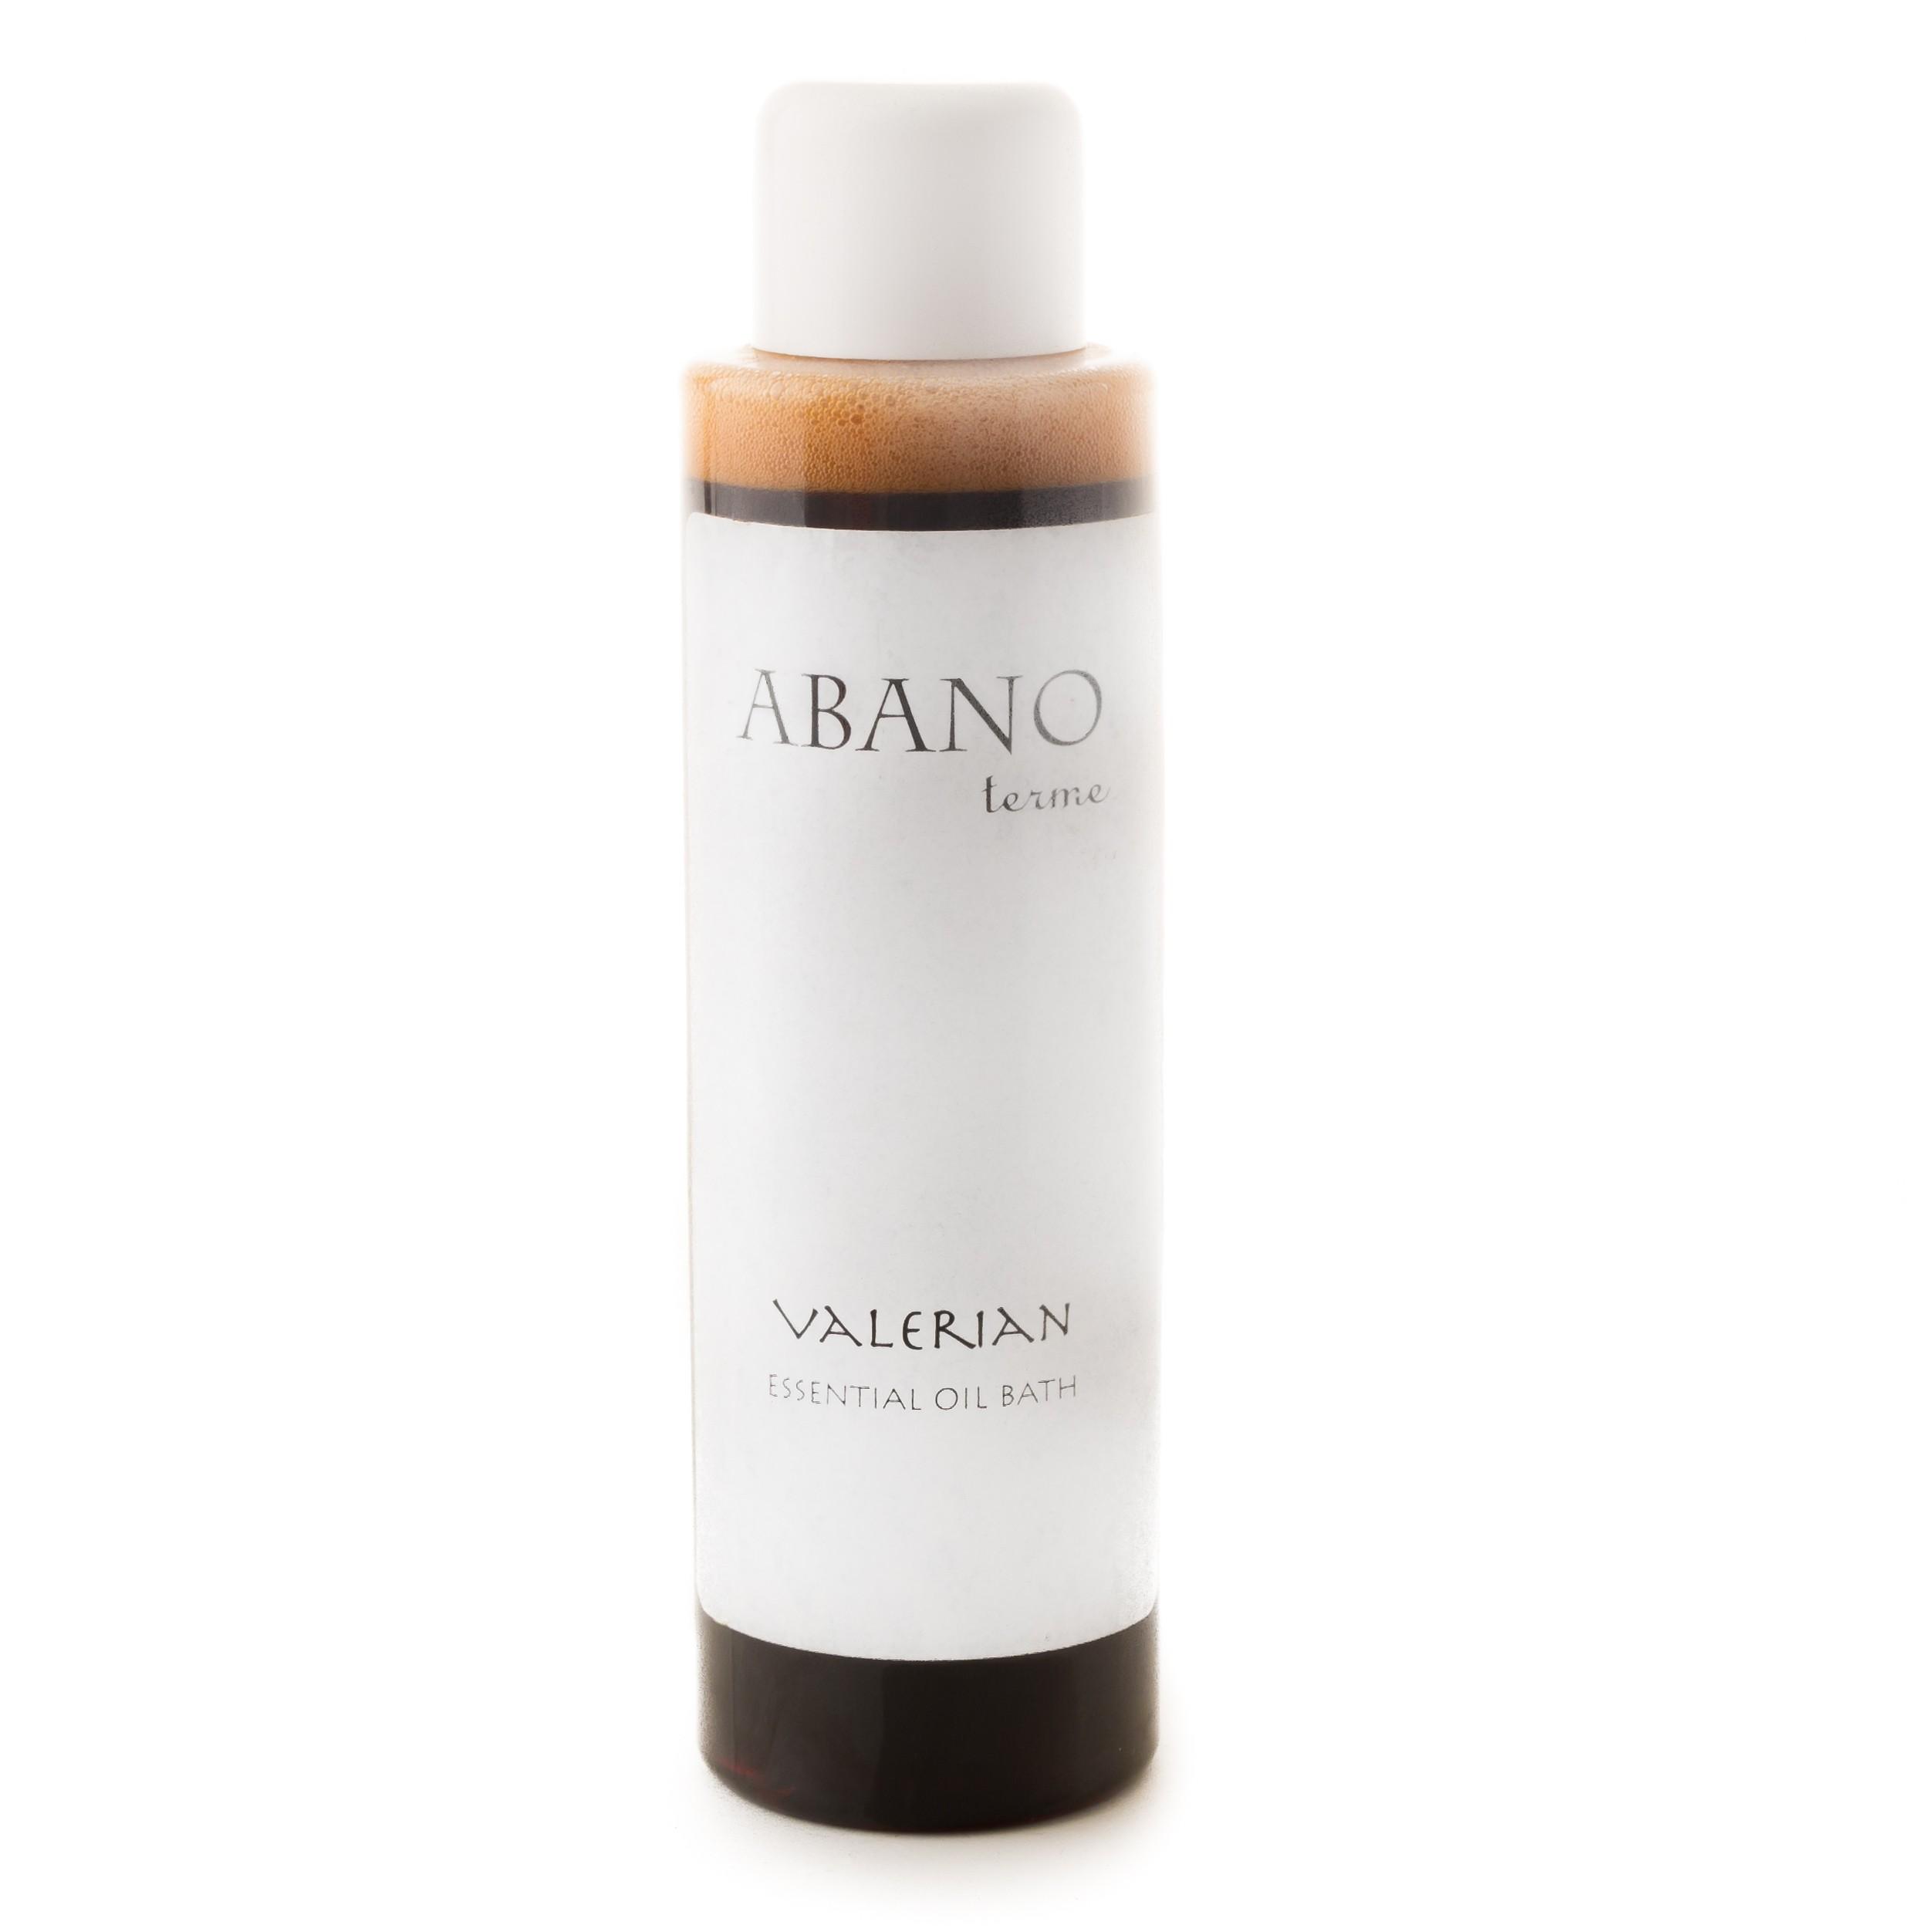 Valerian Bath Oil